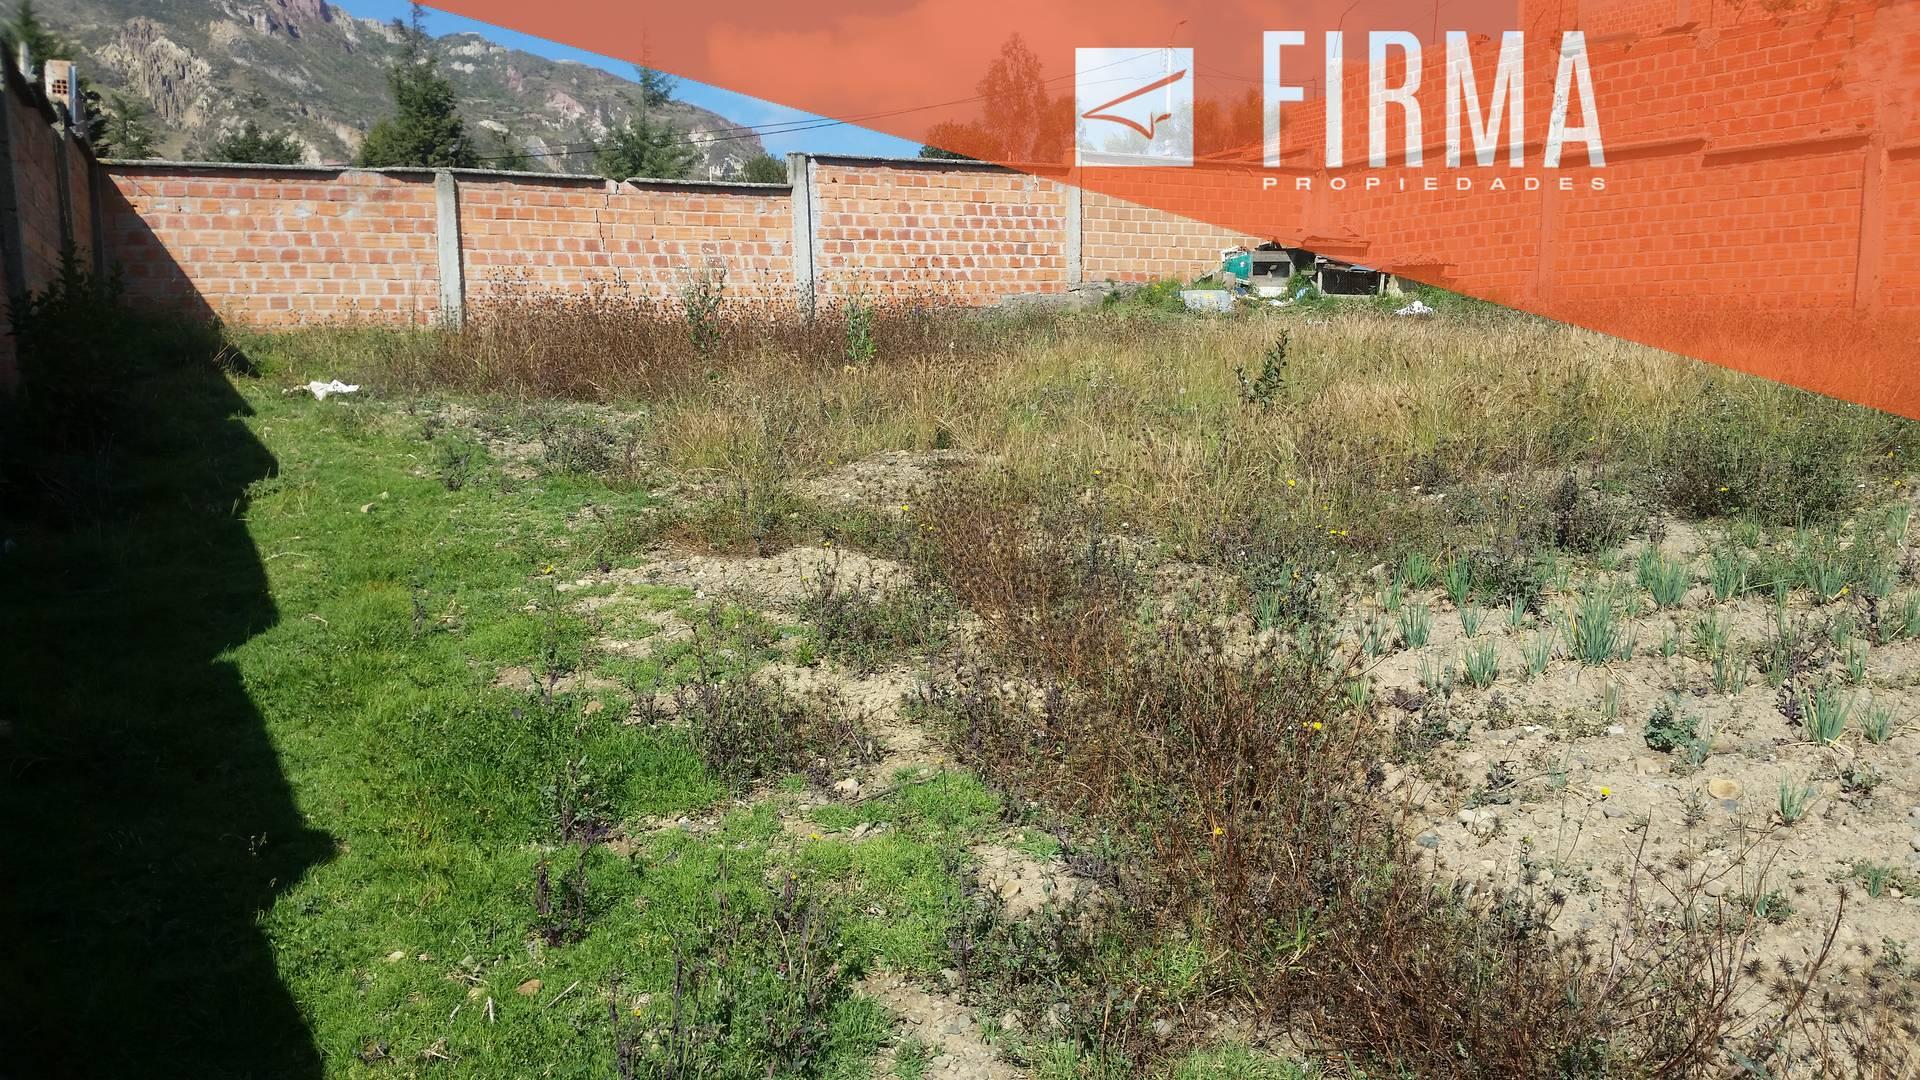 Terreno en Venta FTV34954 – COMPRA ESTE TERRENO EN CODAVISA Foto 1